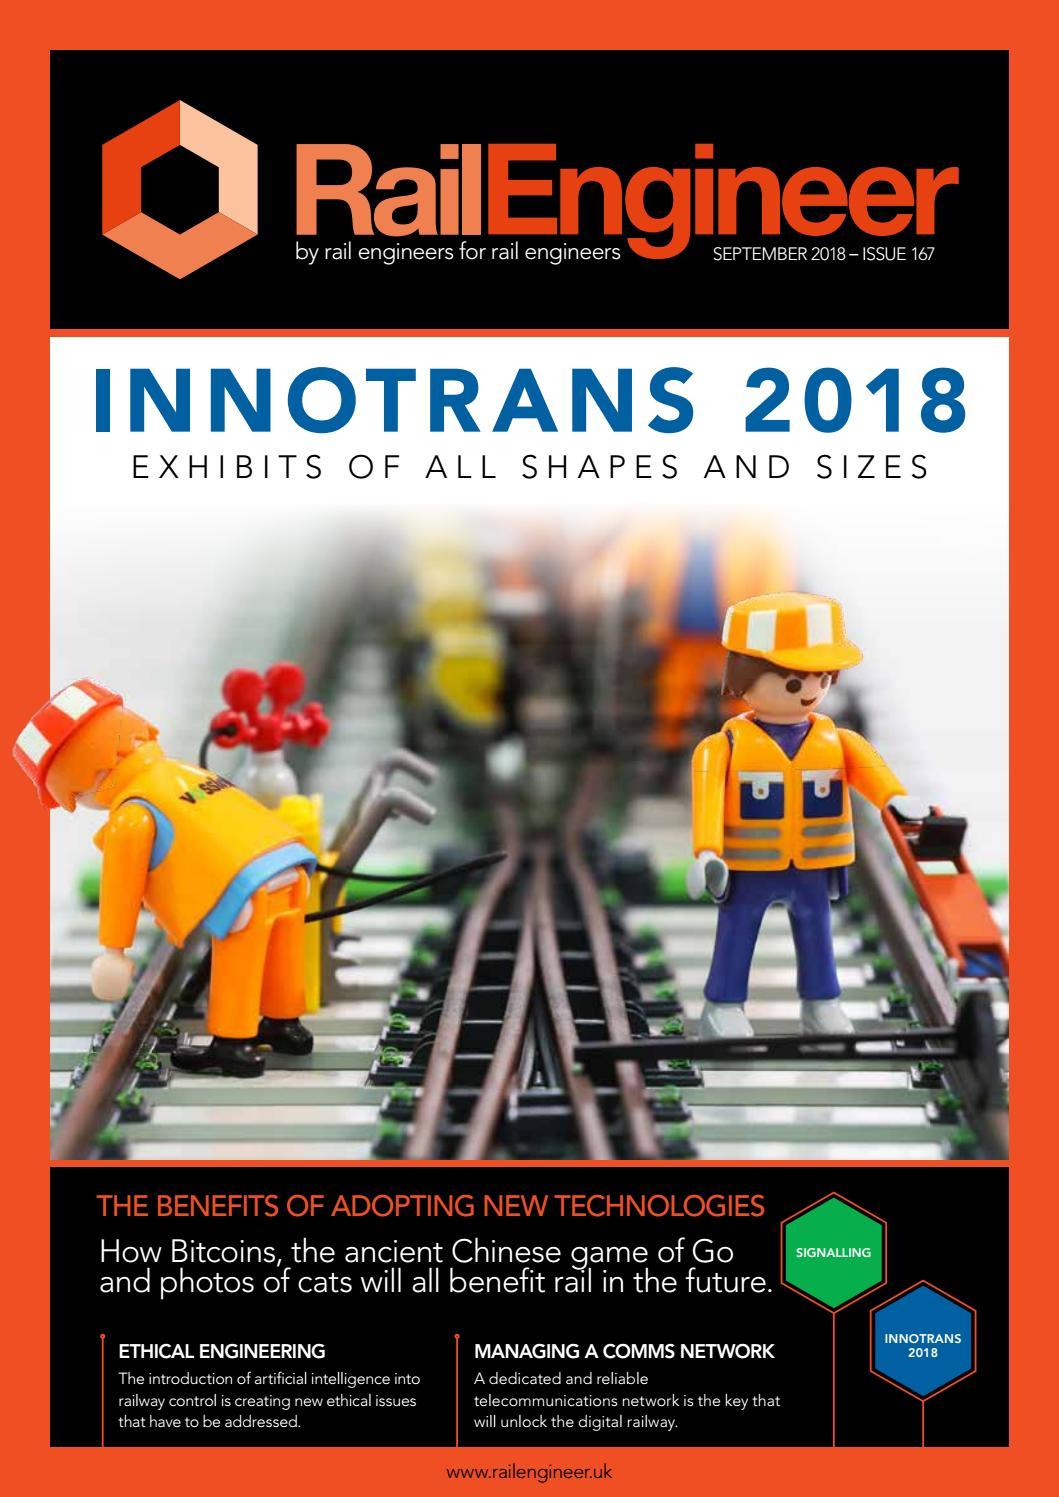 Rail Engineer - Issue 167 - September 2018 by Rail Media - issuu